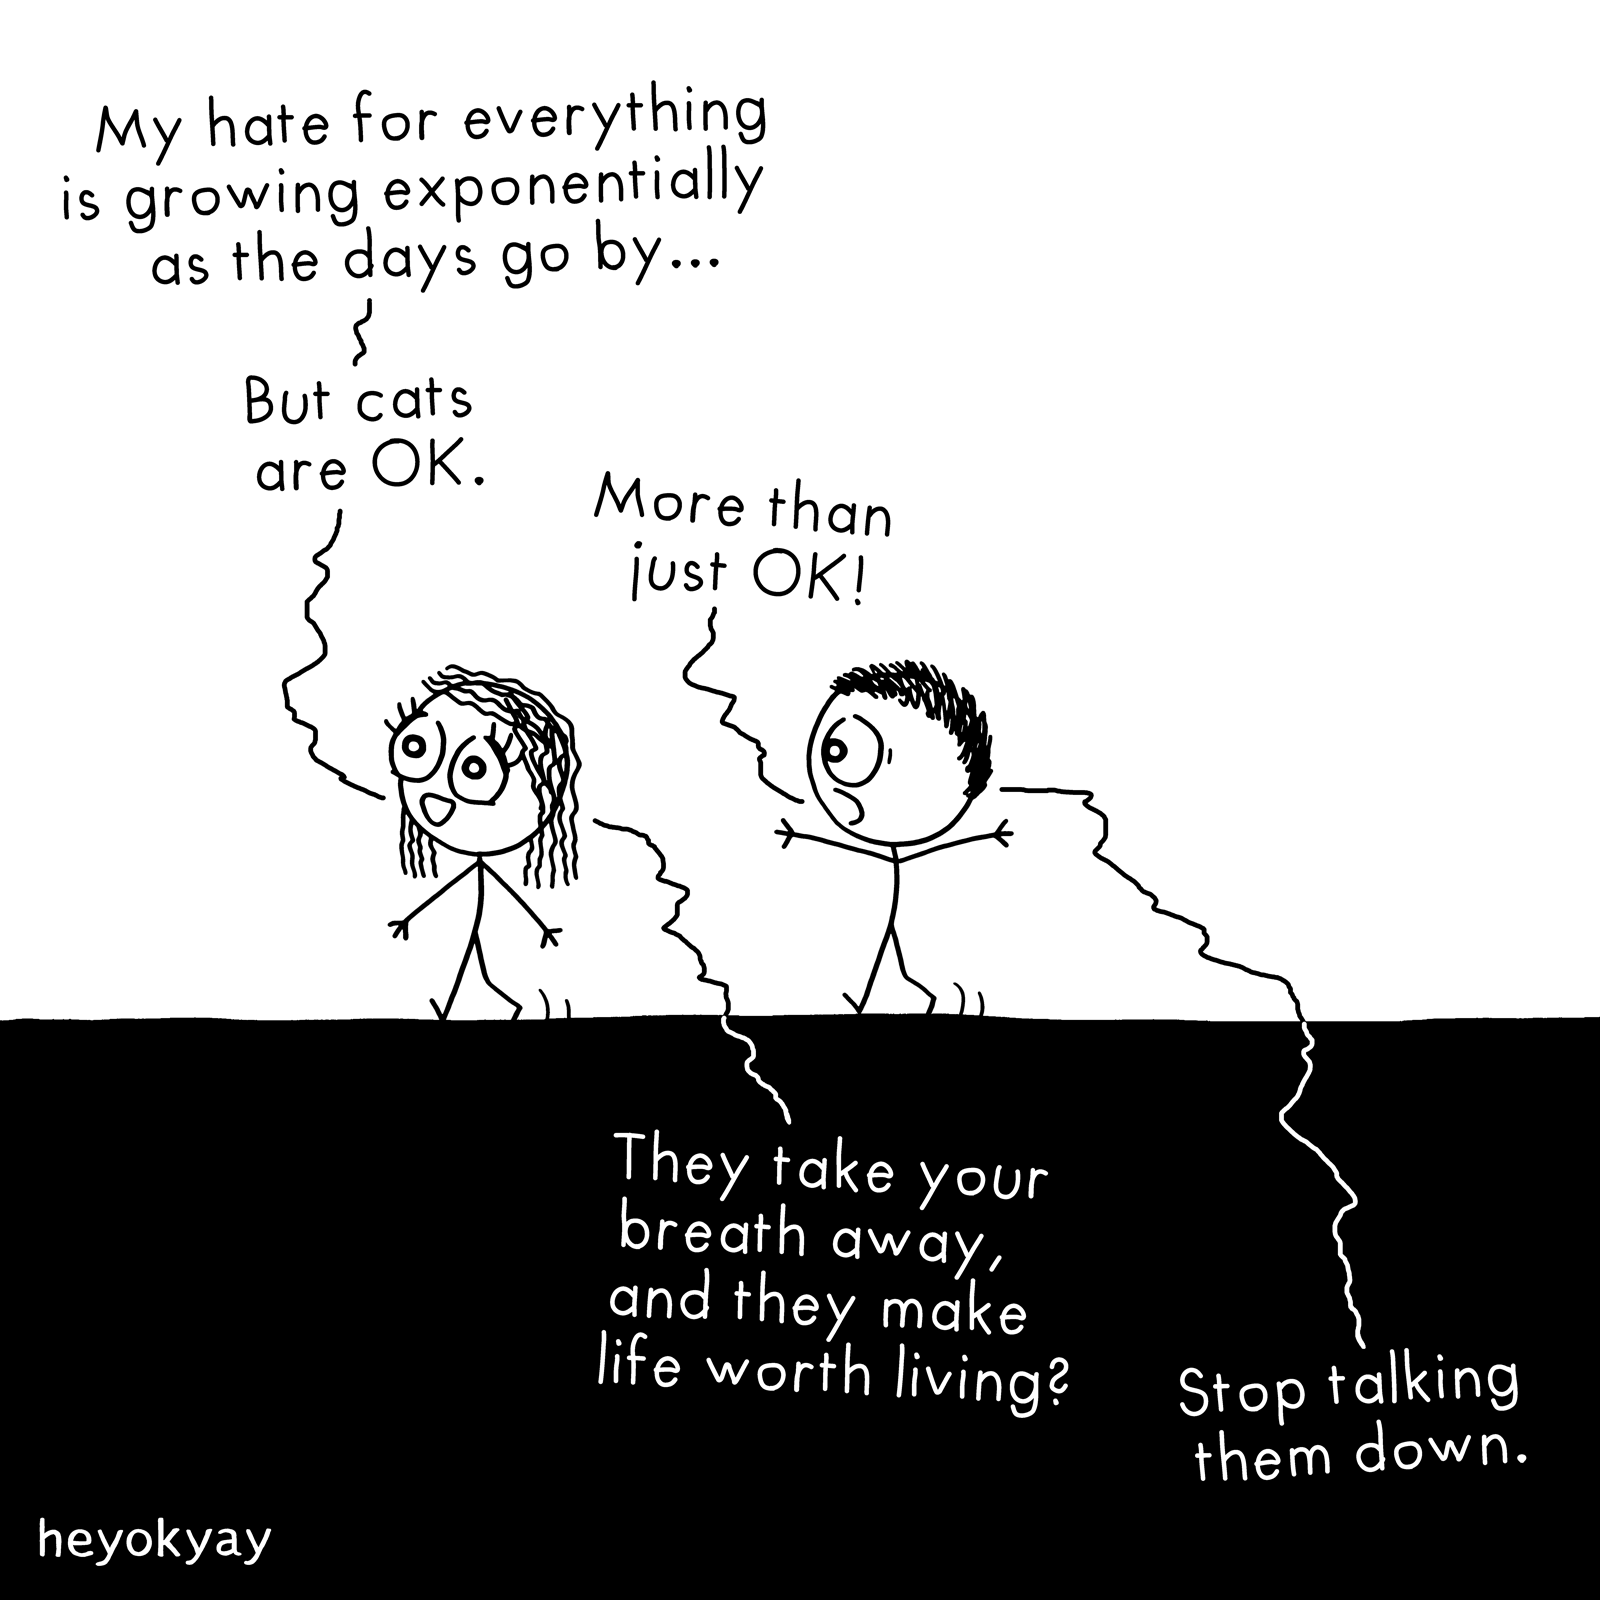 The Big Picture heyokyay comic